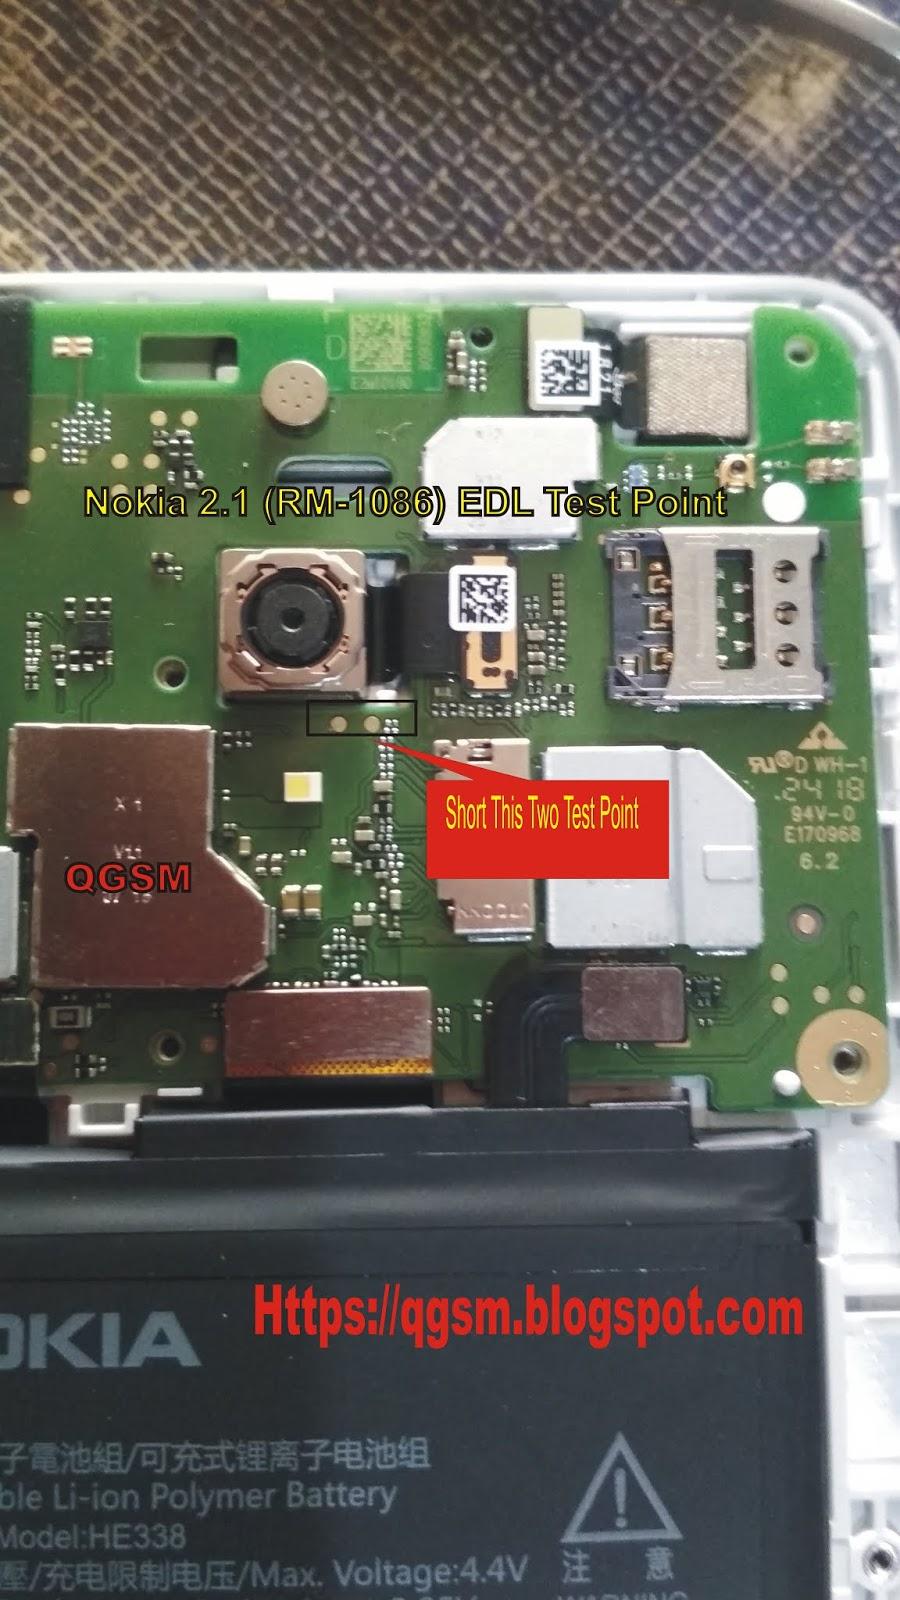 Nokia 2 1 Test Point - QGSM